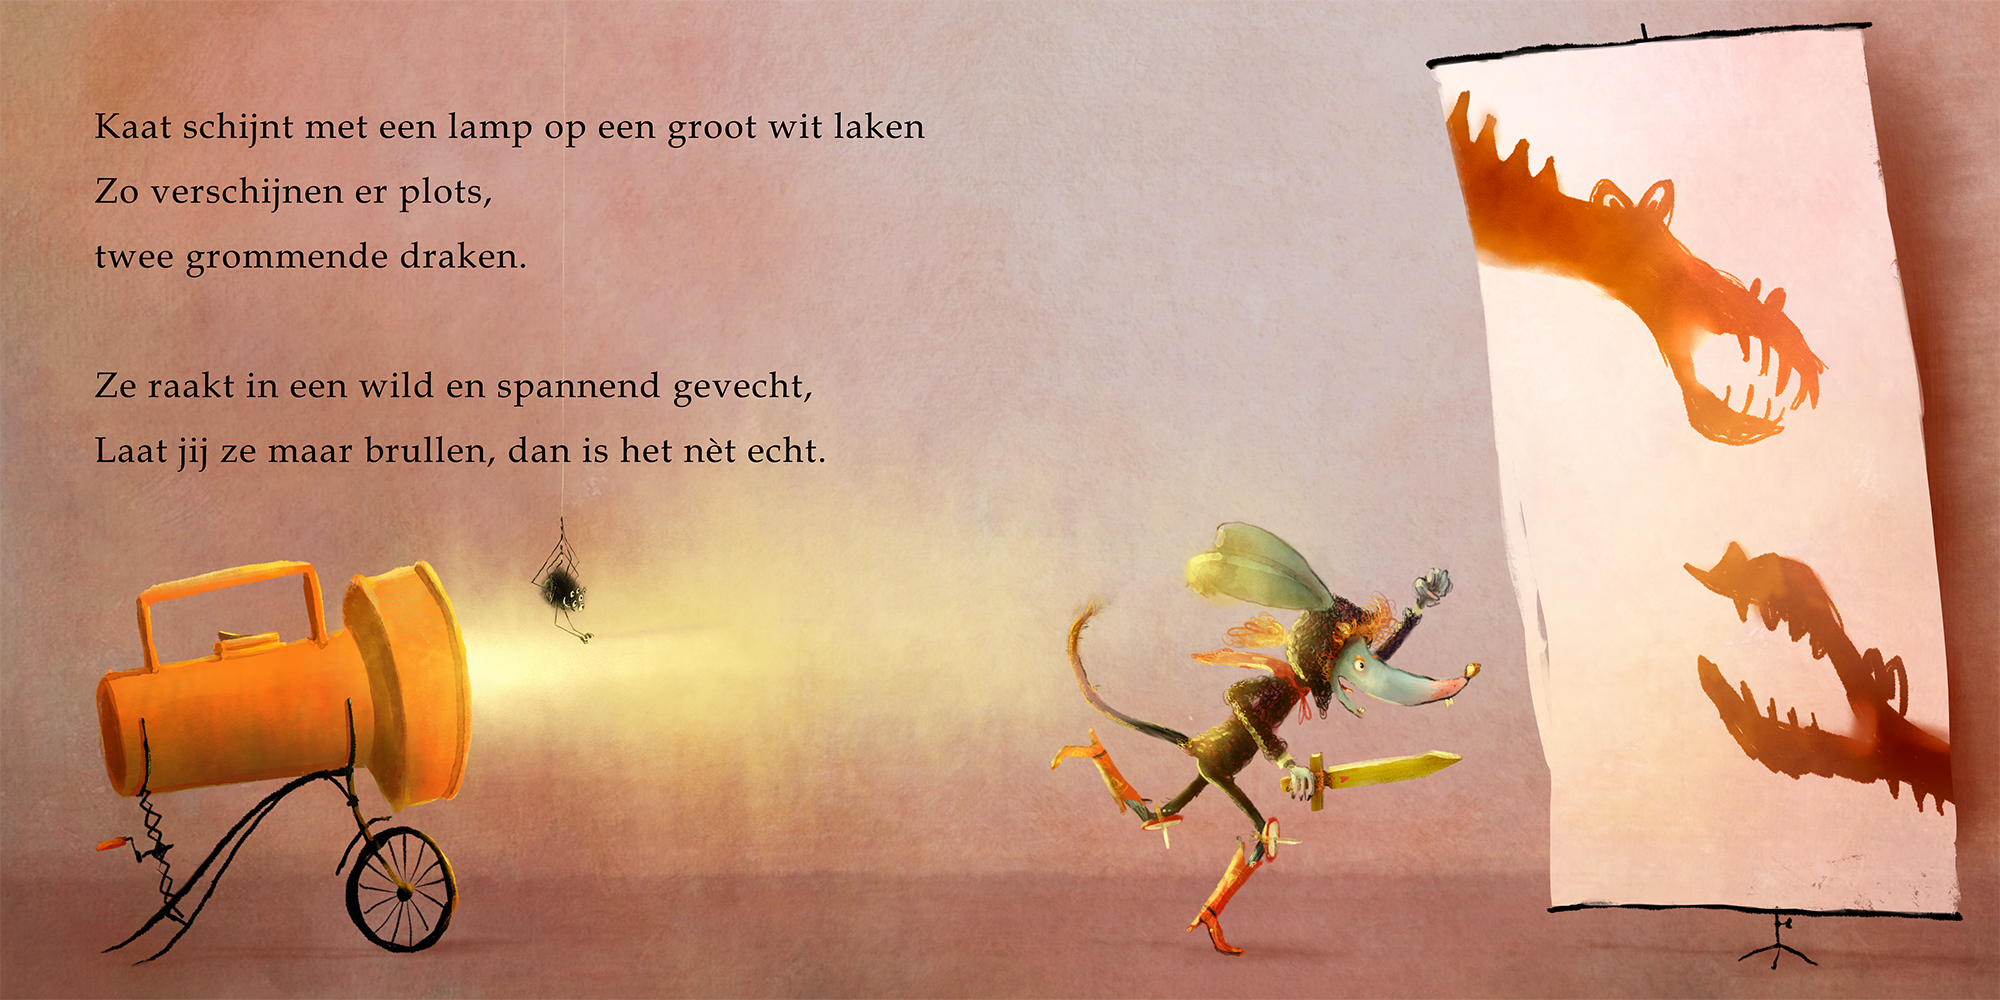 spread6_kaat_draken.jpg